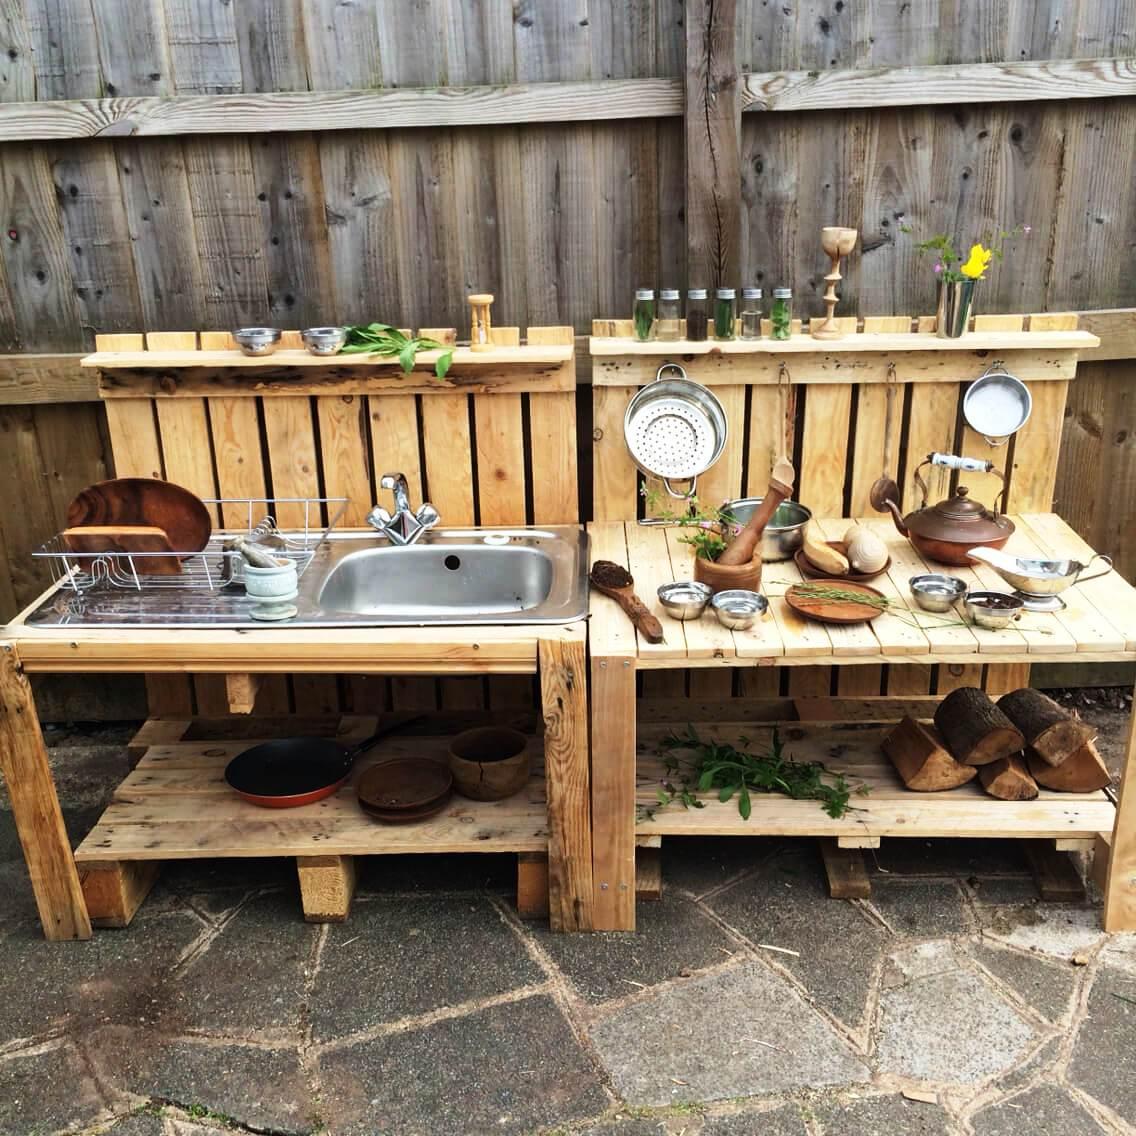 20 Beautiful Outdoor Kitchen Ideas: 20 Elegant Outdoor Kitchen Design Ideas Will Amaze You